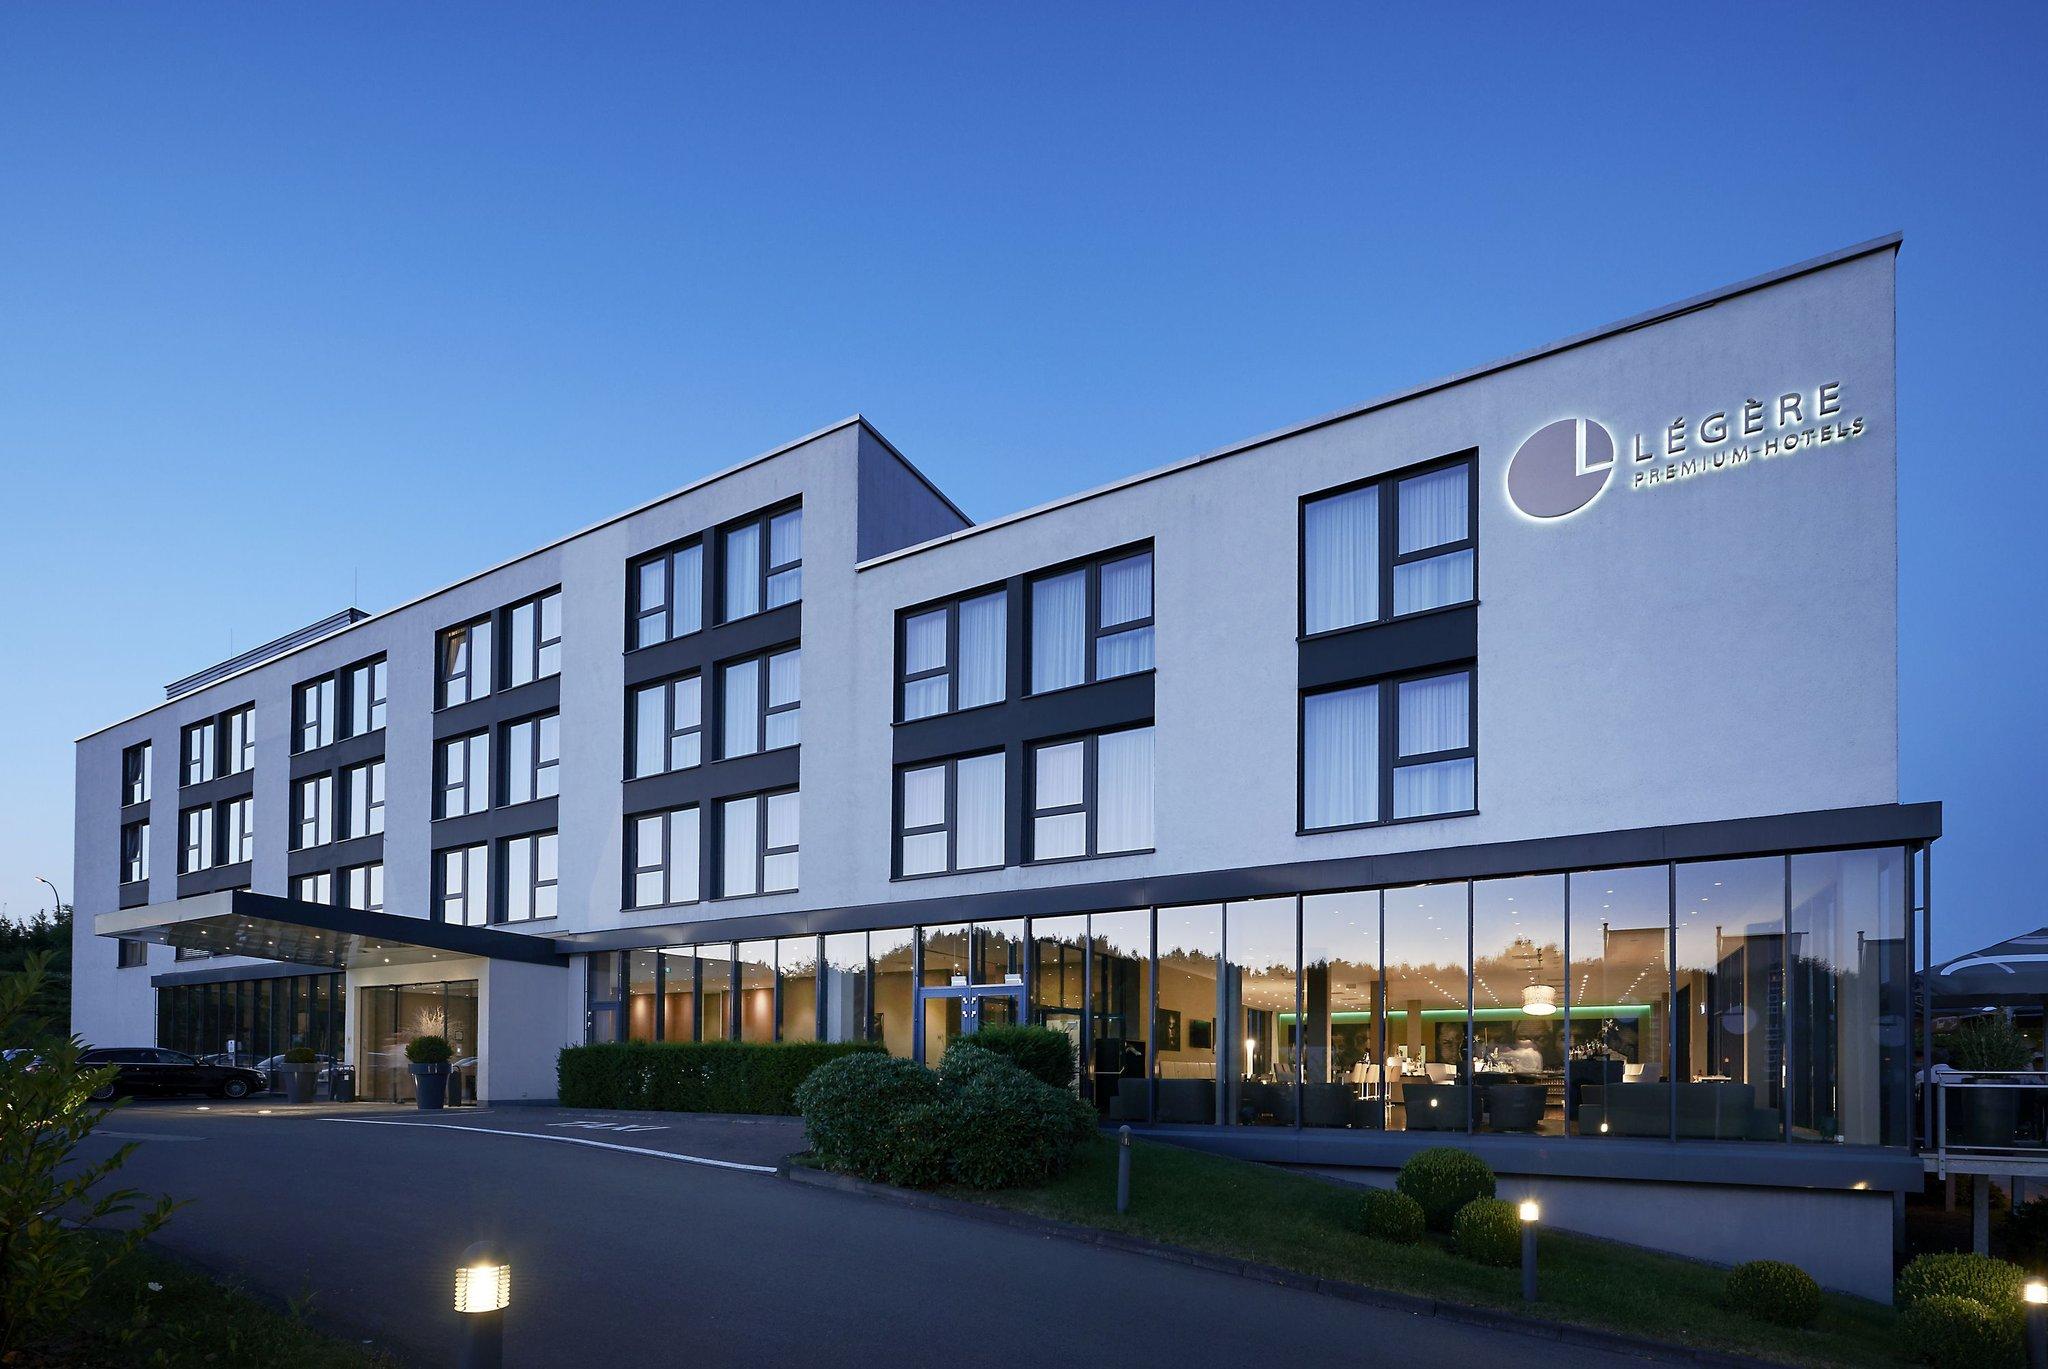 Legere Premium Hotel Luxembourg